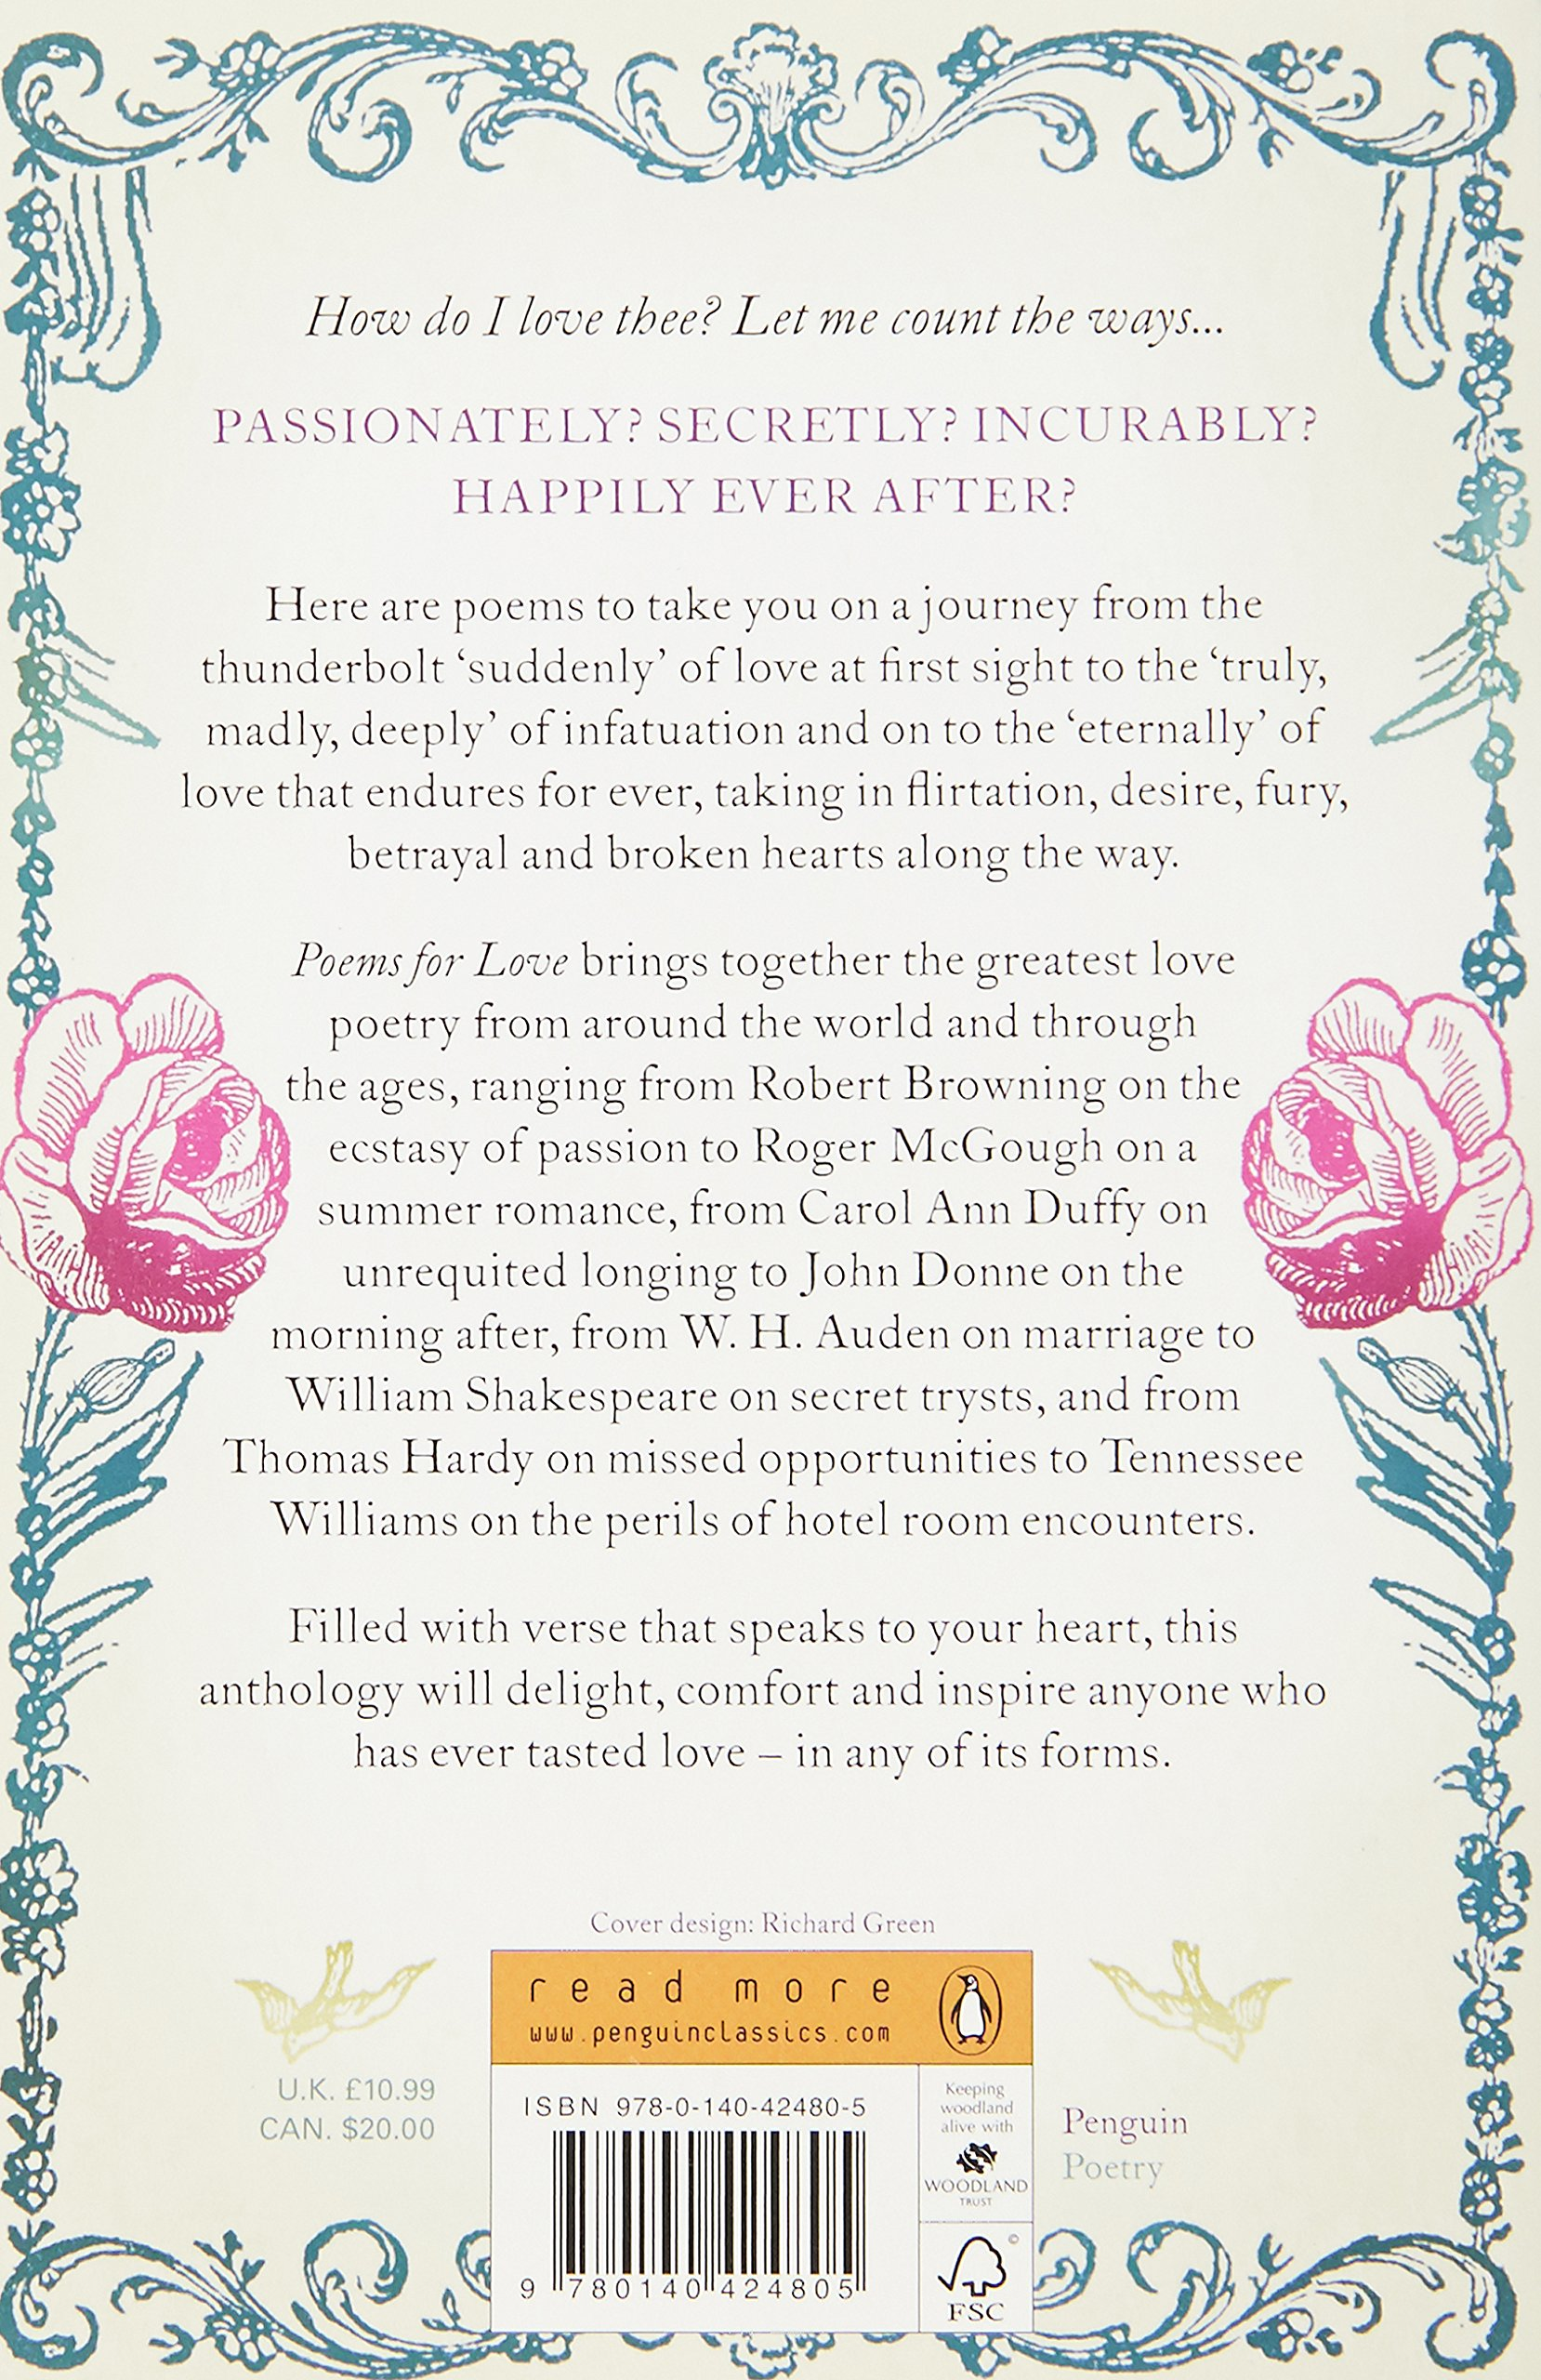 Penguin's Poems for Love (Penguin Classics): Amazon co uk